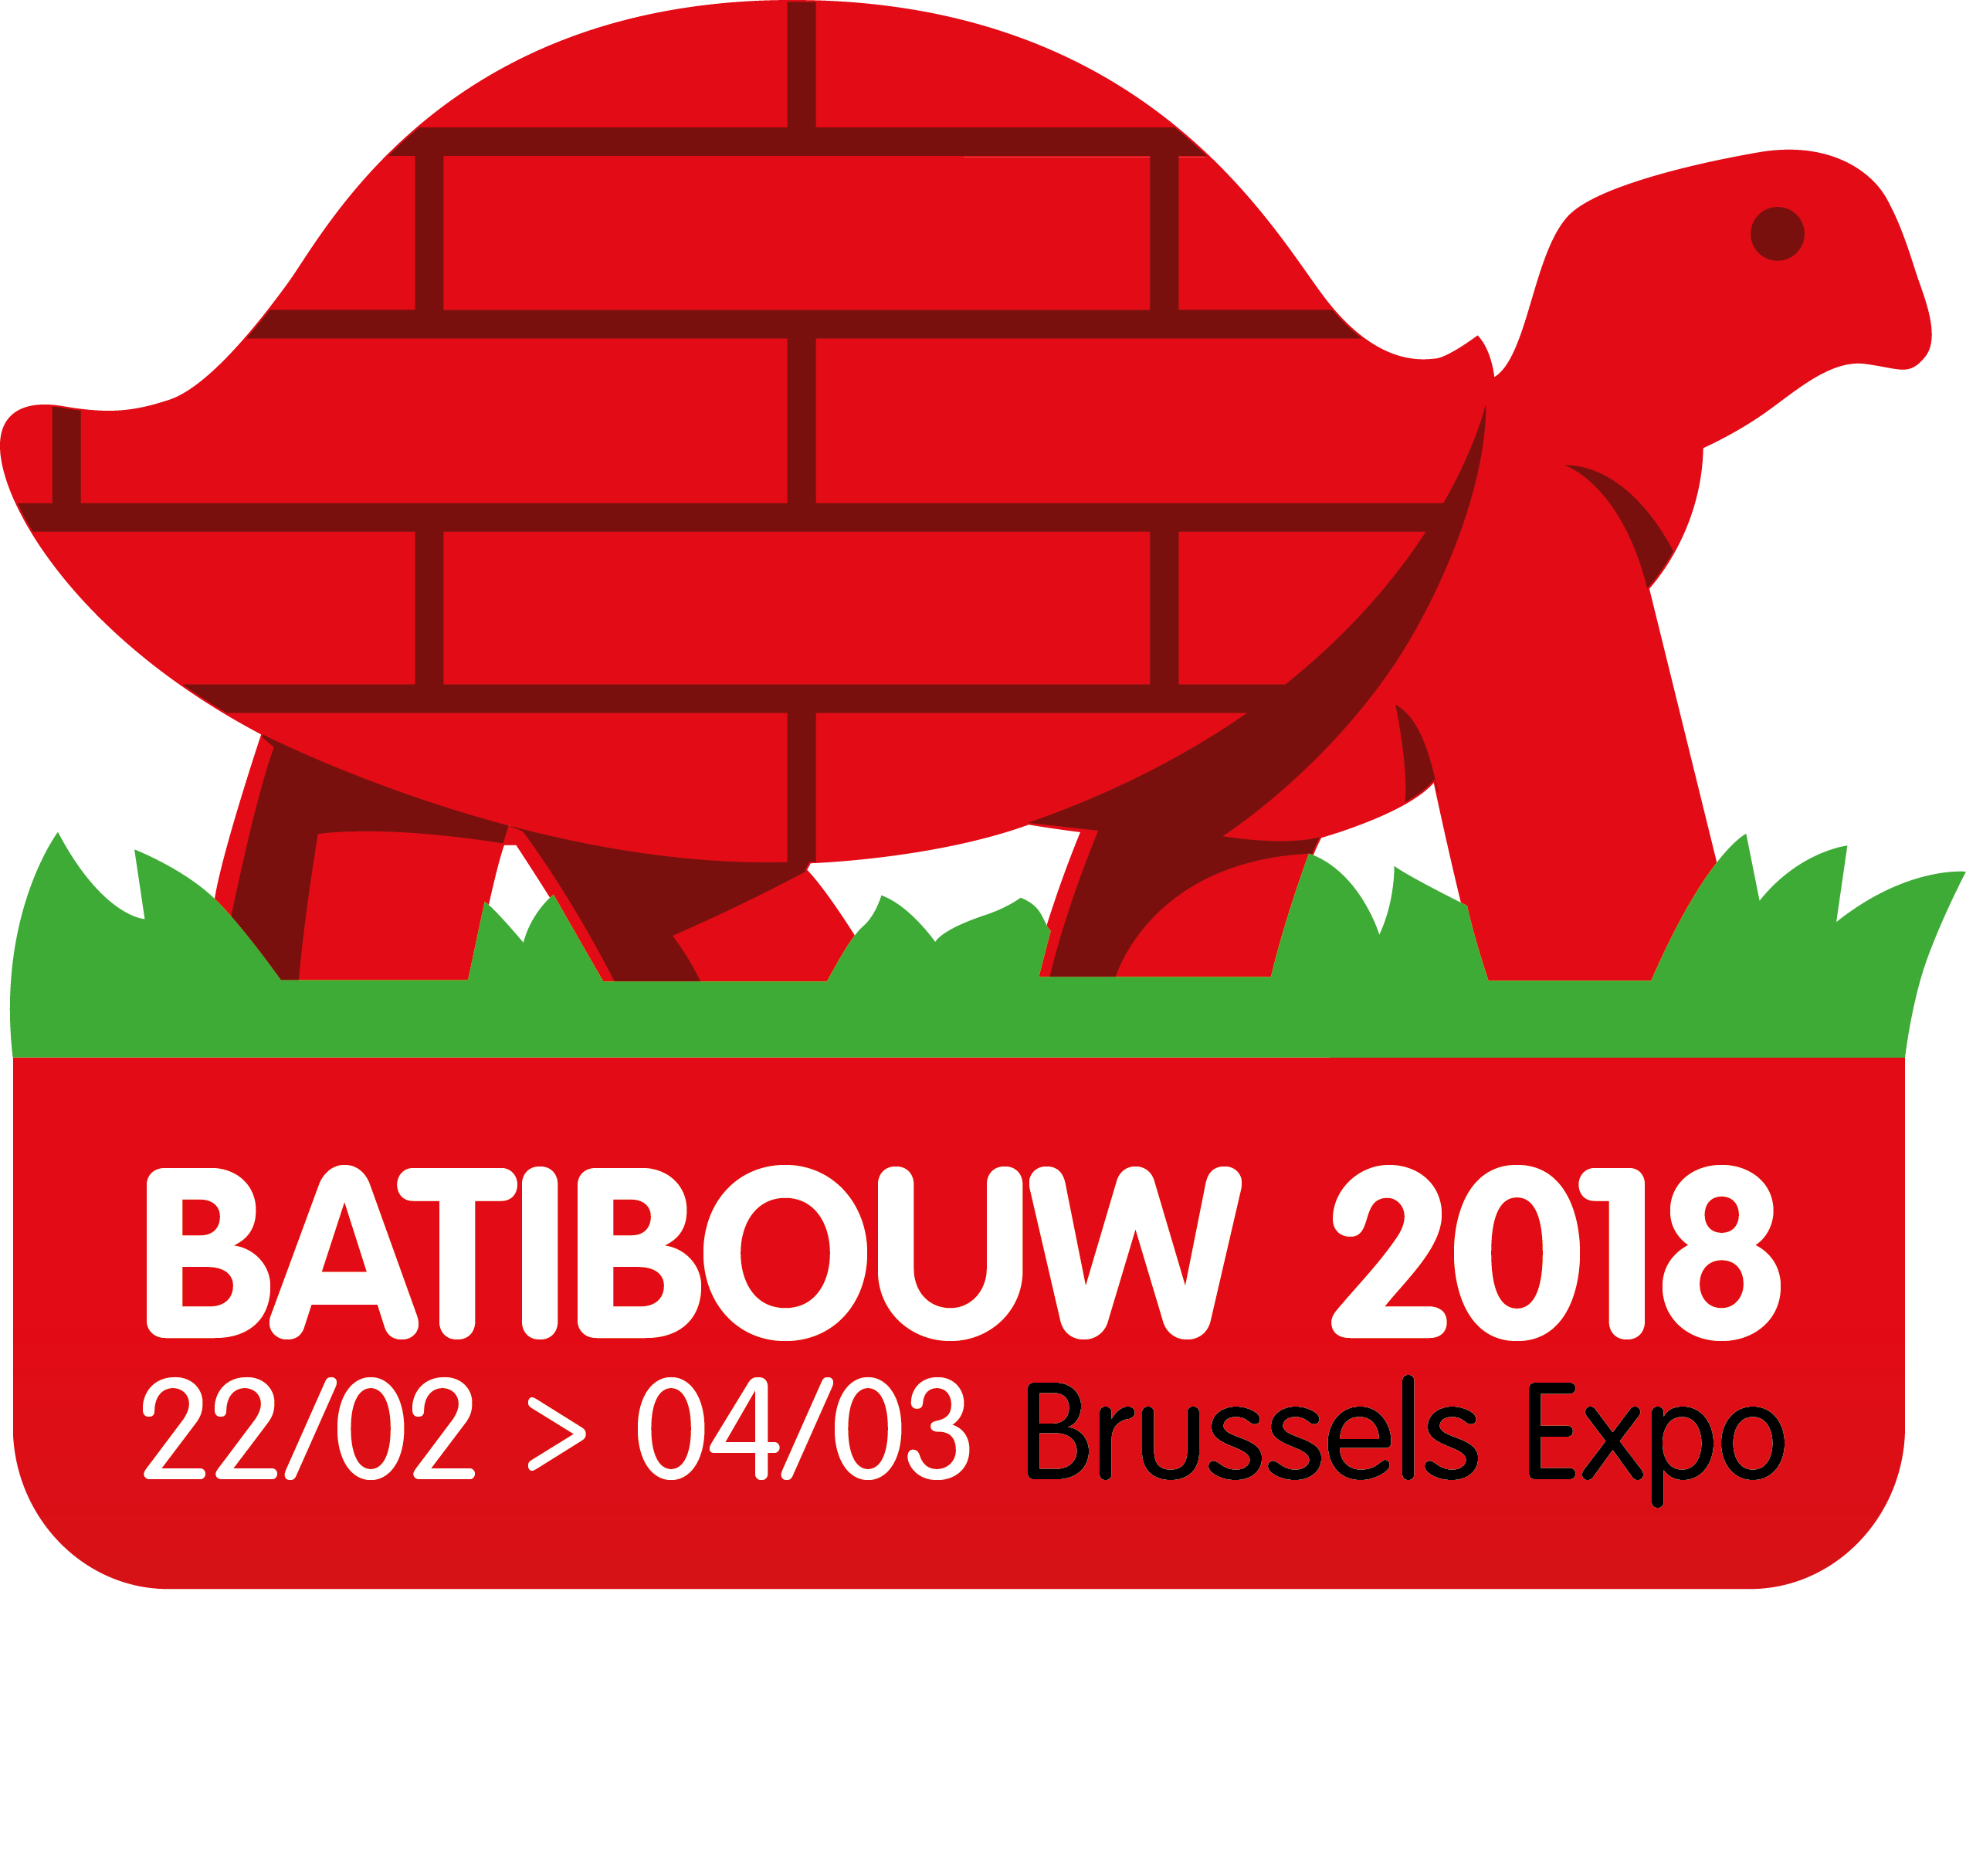 Batibouw 2018 22.02 au 04.03